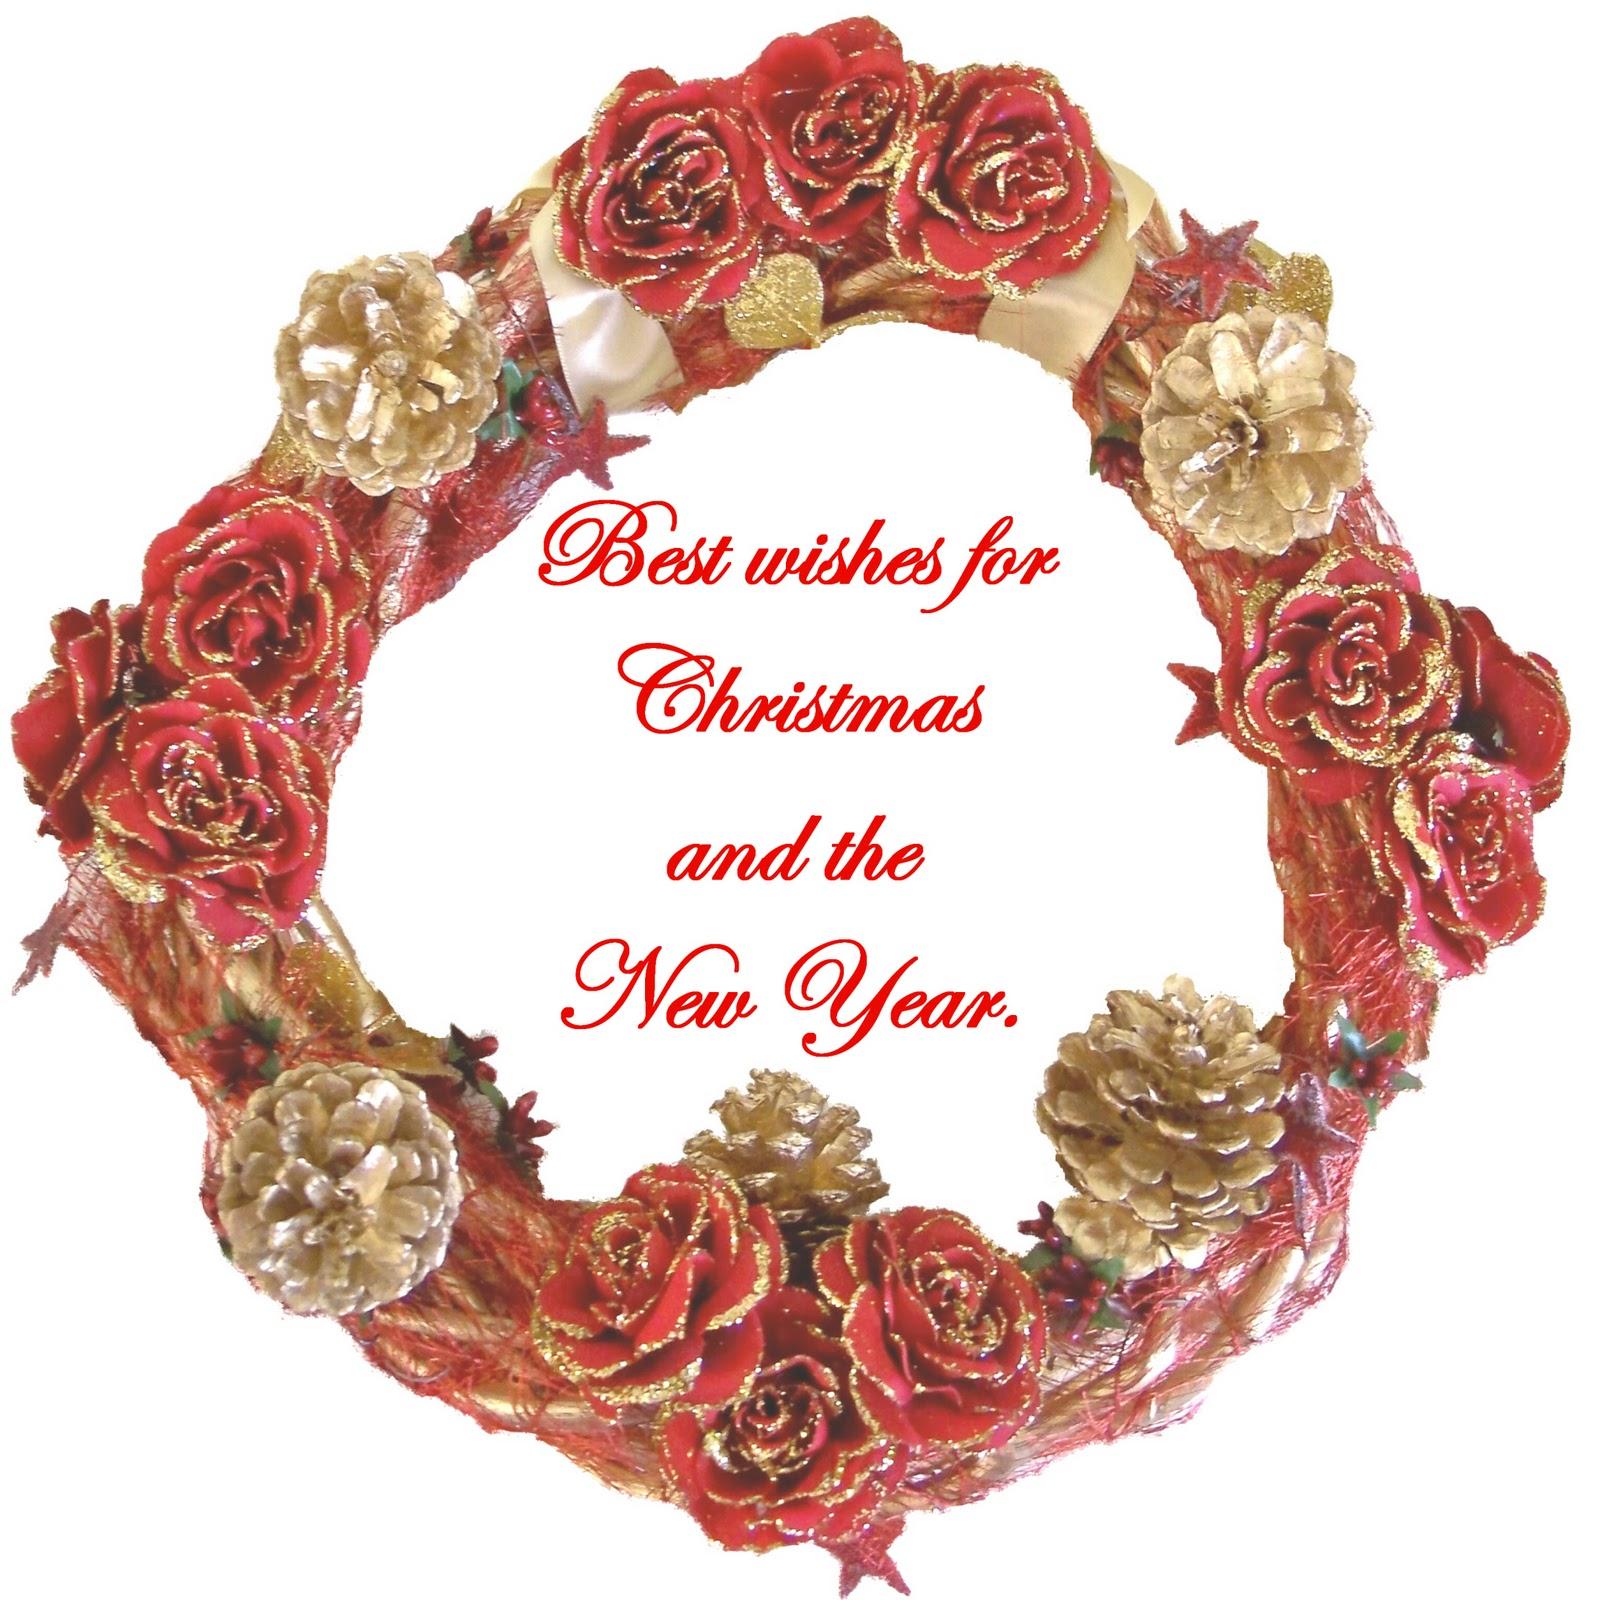 Zunea Zunea Christmas Card Greetings Wording Christmas Greeting